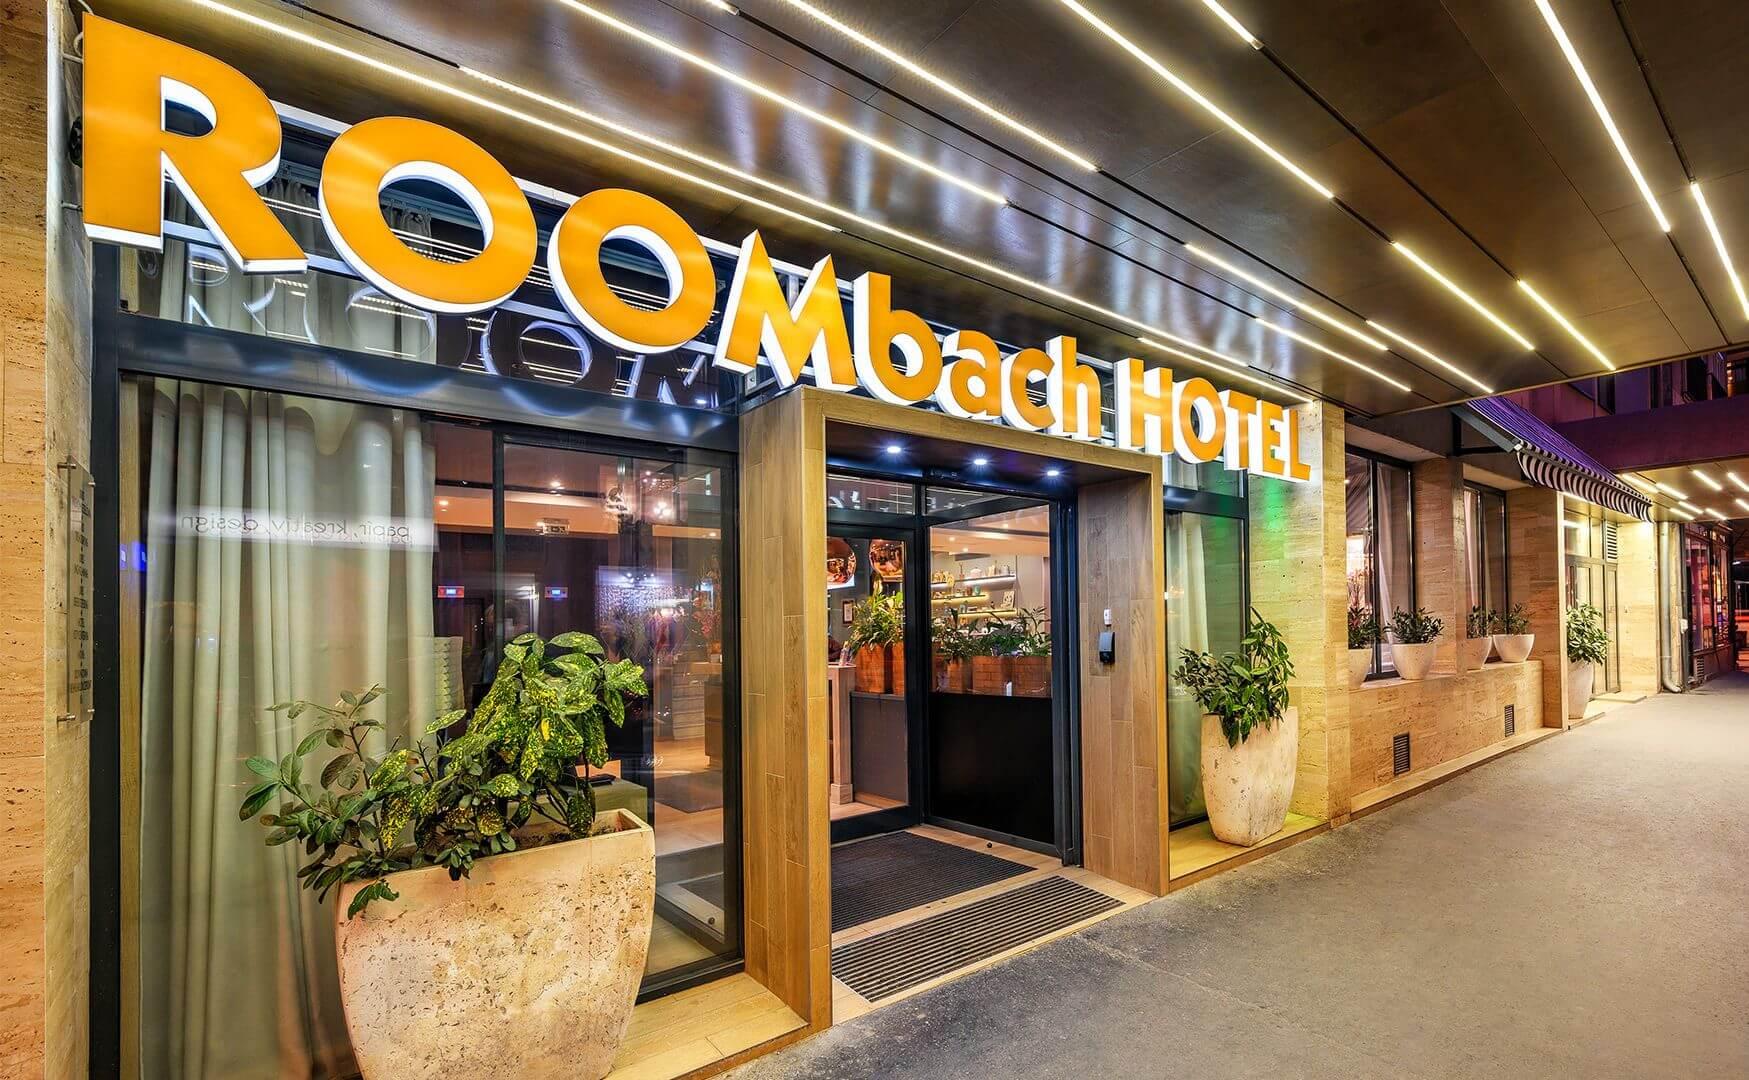 Roombach Hotel Budapest בית מלון 3 כוכבים בבודפשט